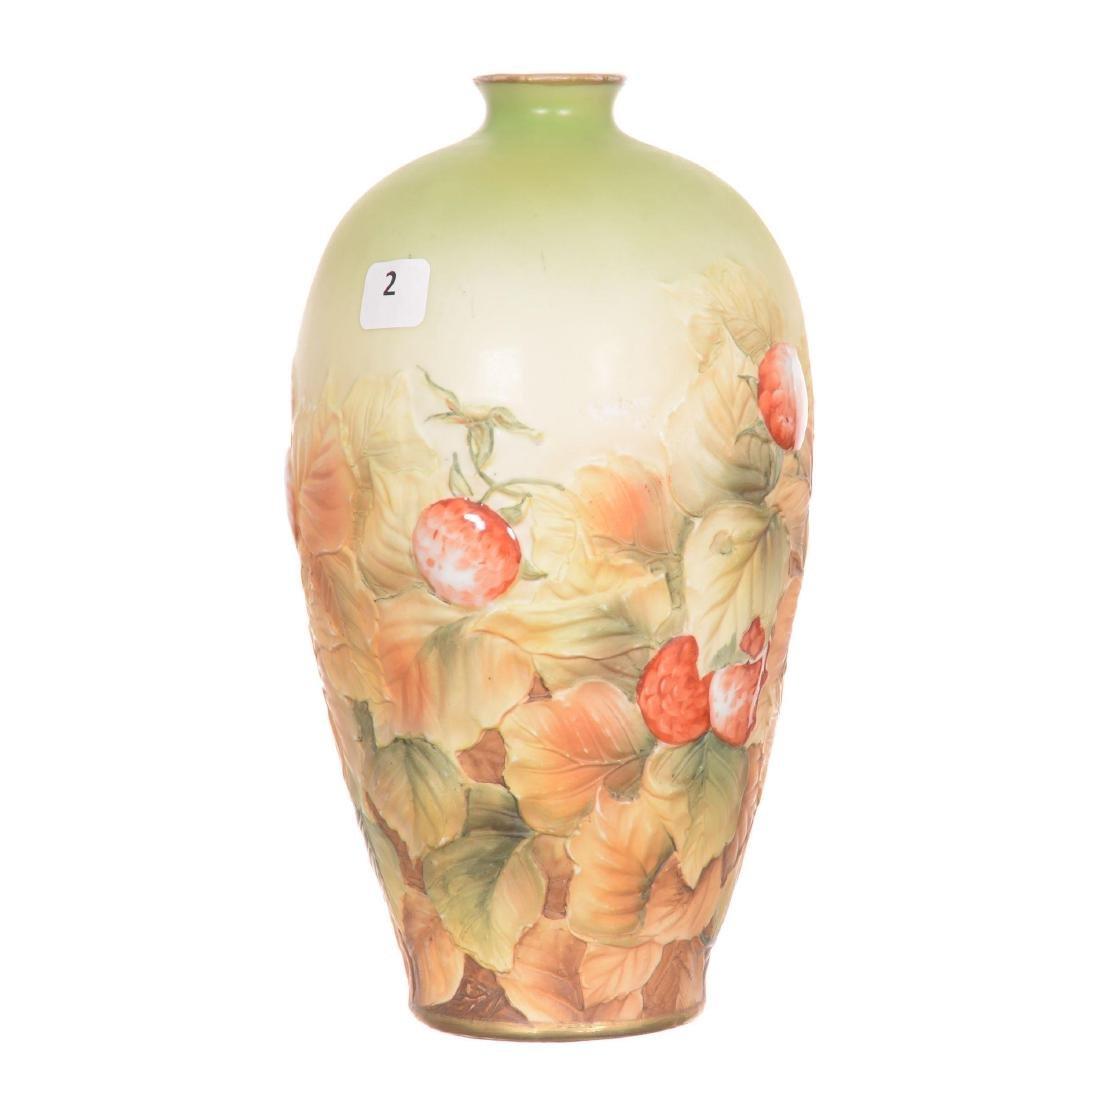 Nippon Blown Mold Vase - 2